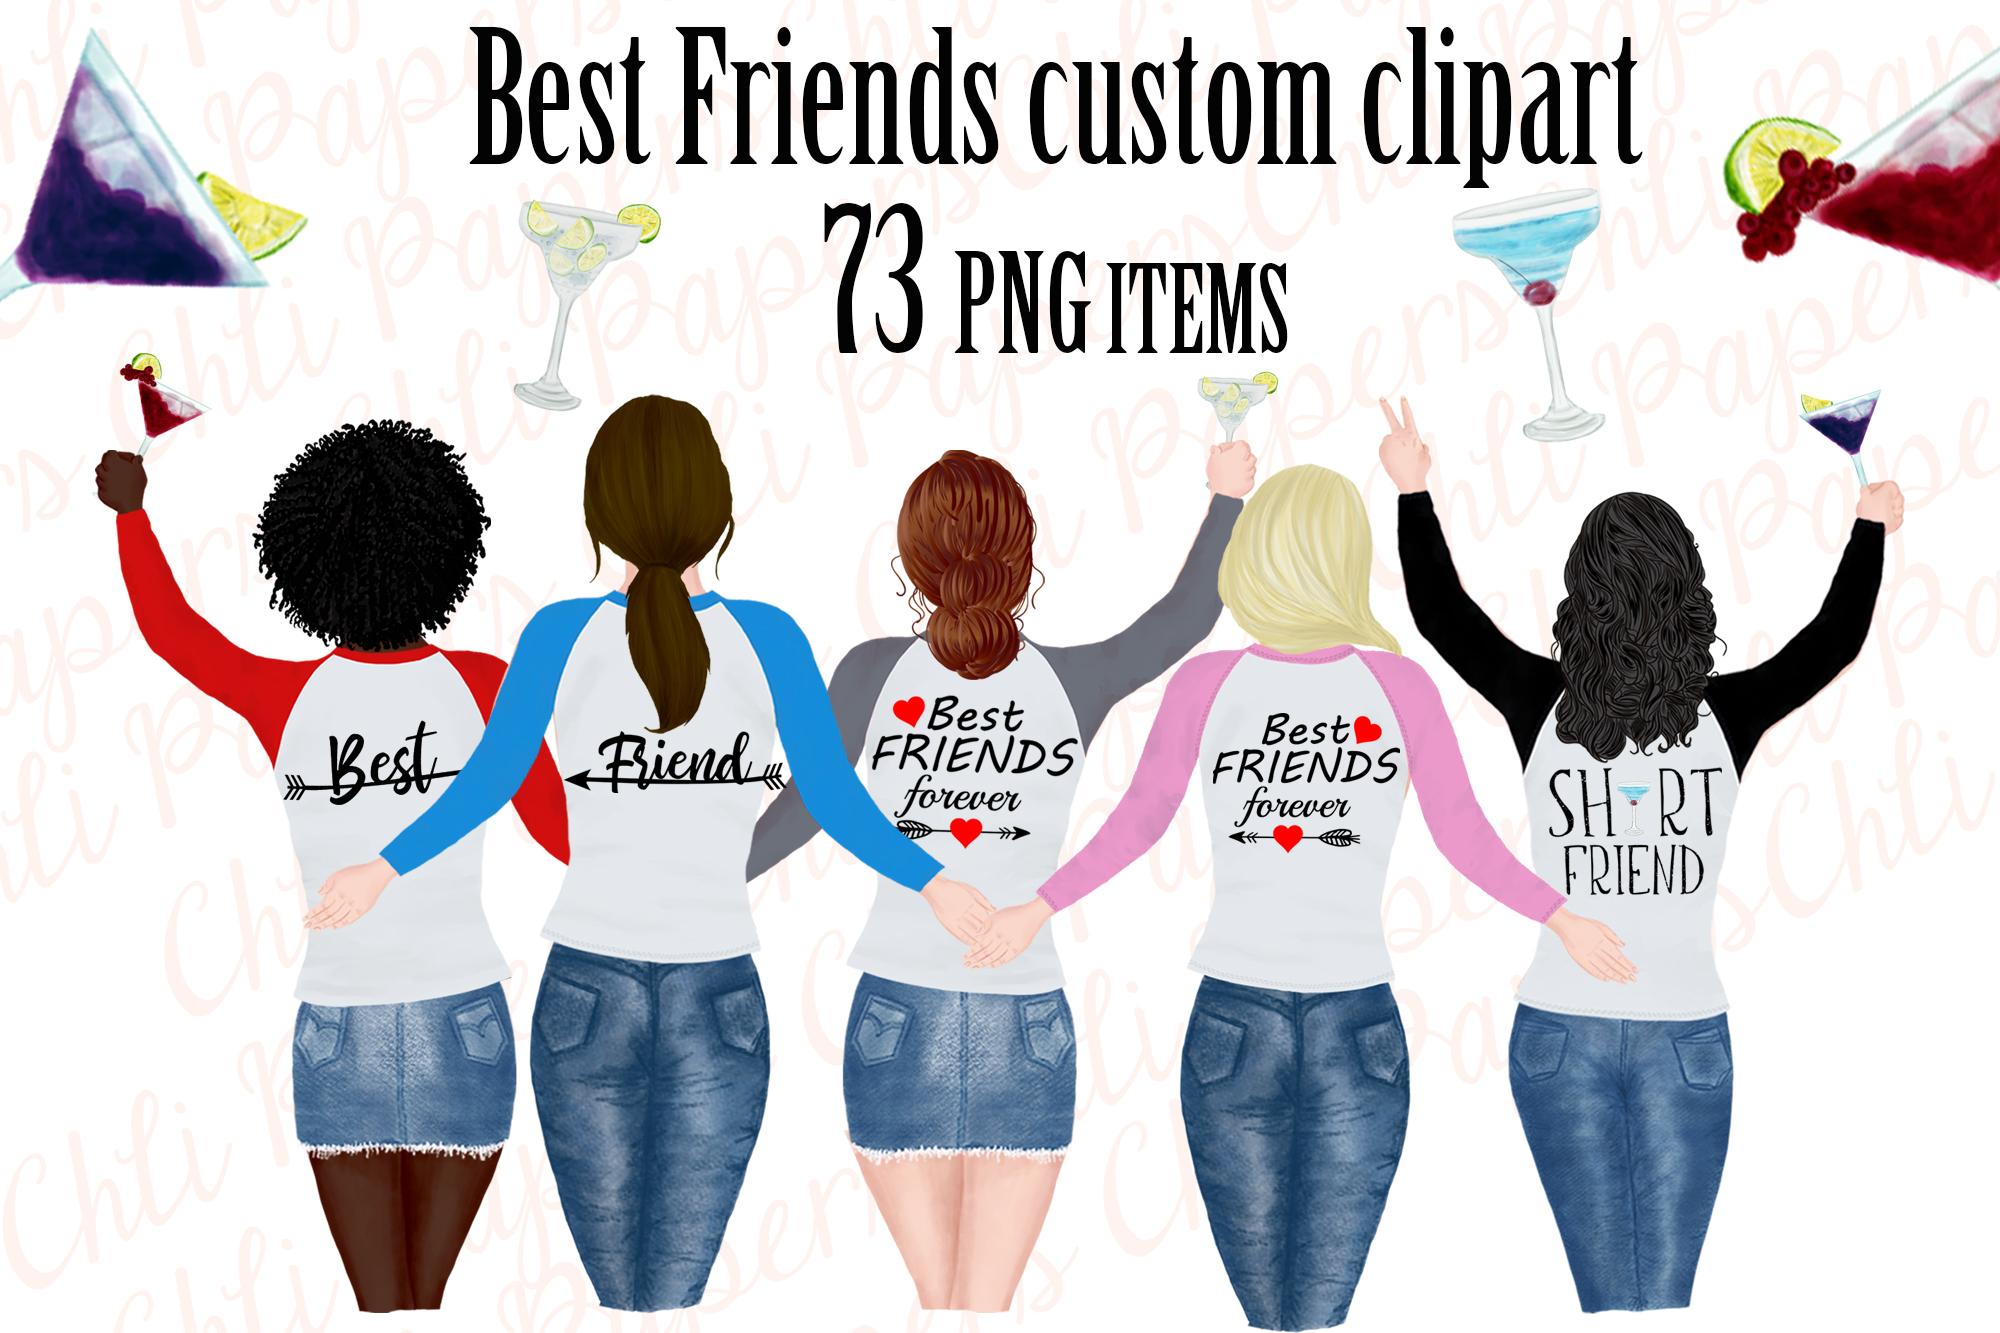 Best friend clipart,Portret creator,Bachelorette party girls example image 1